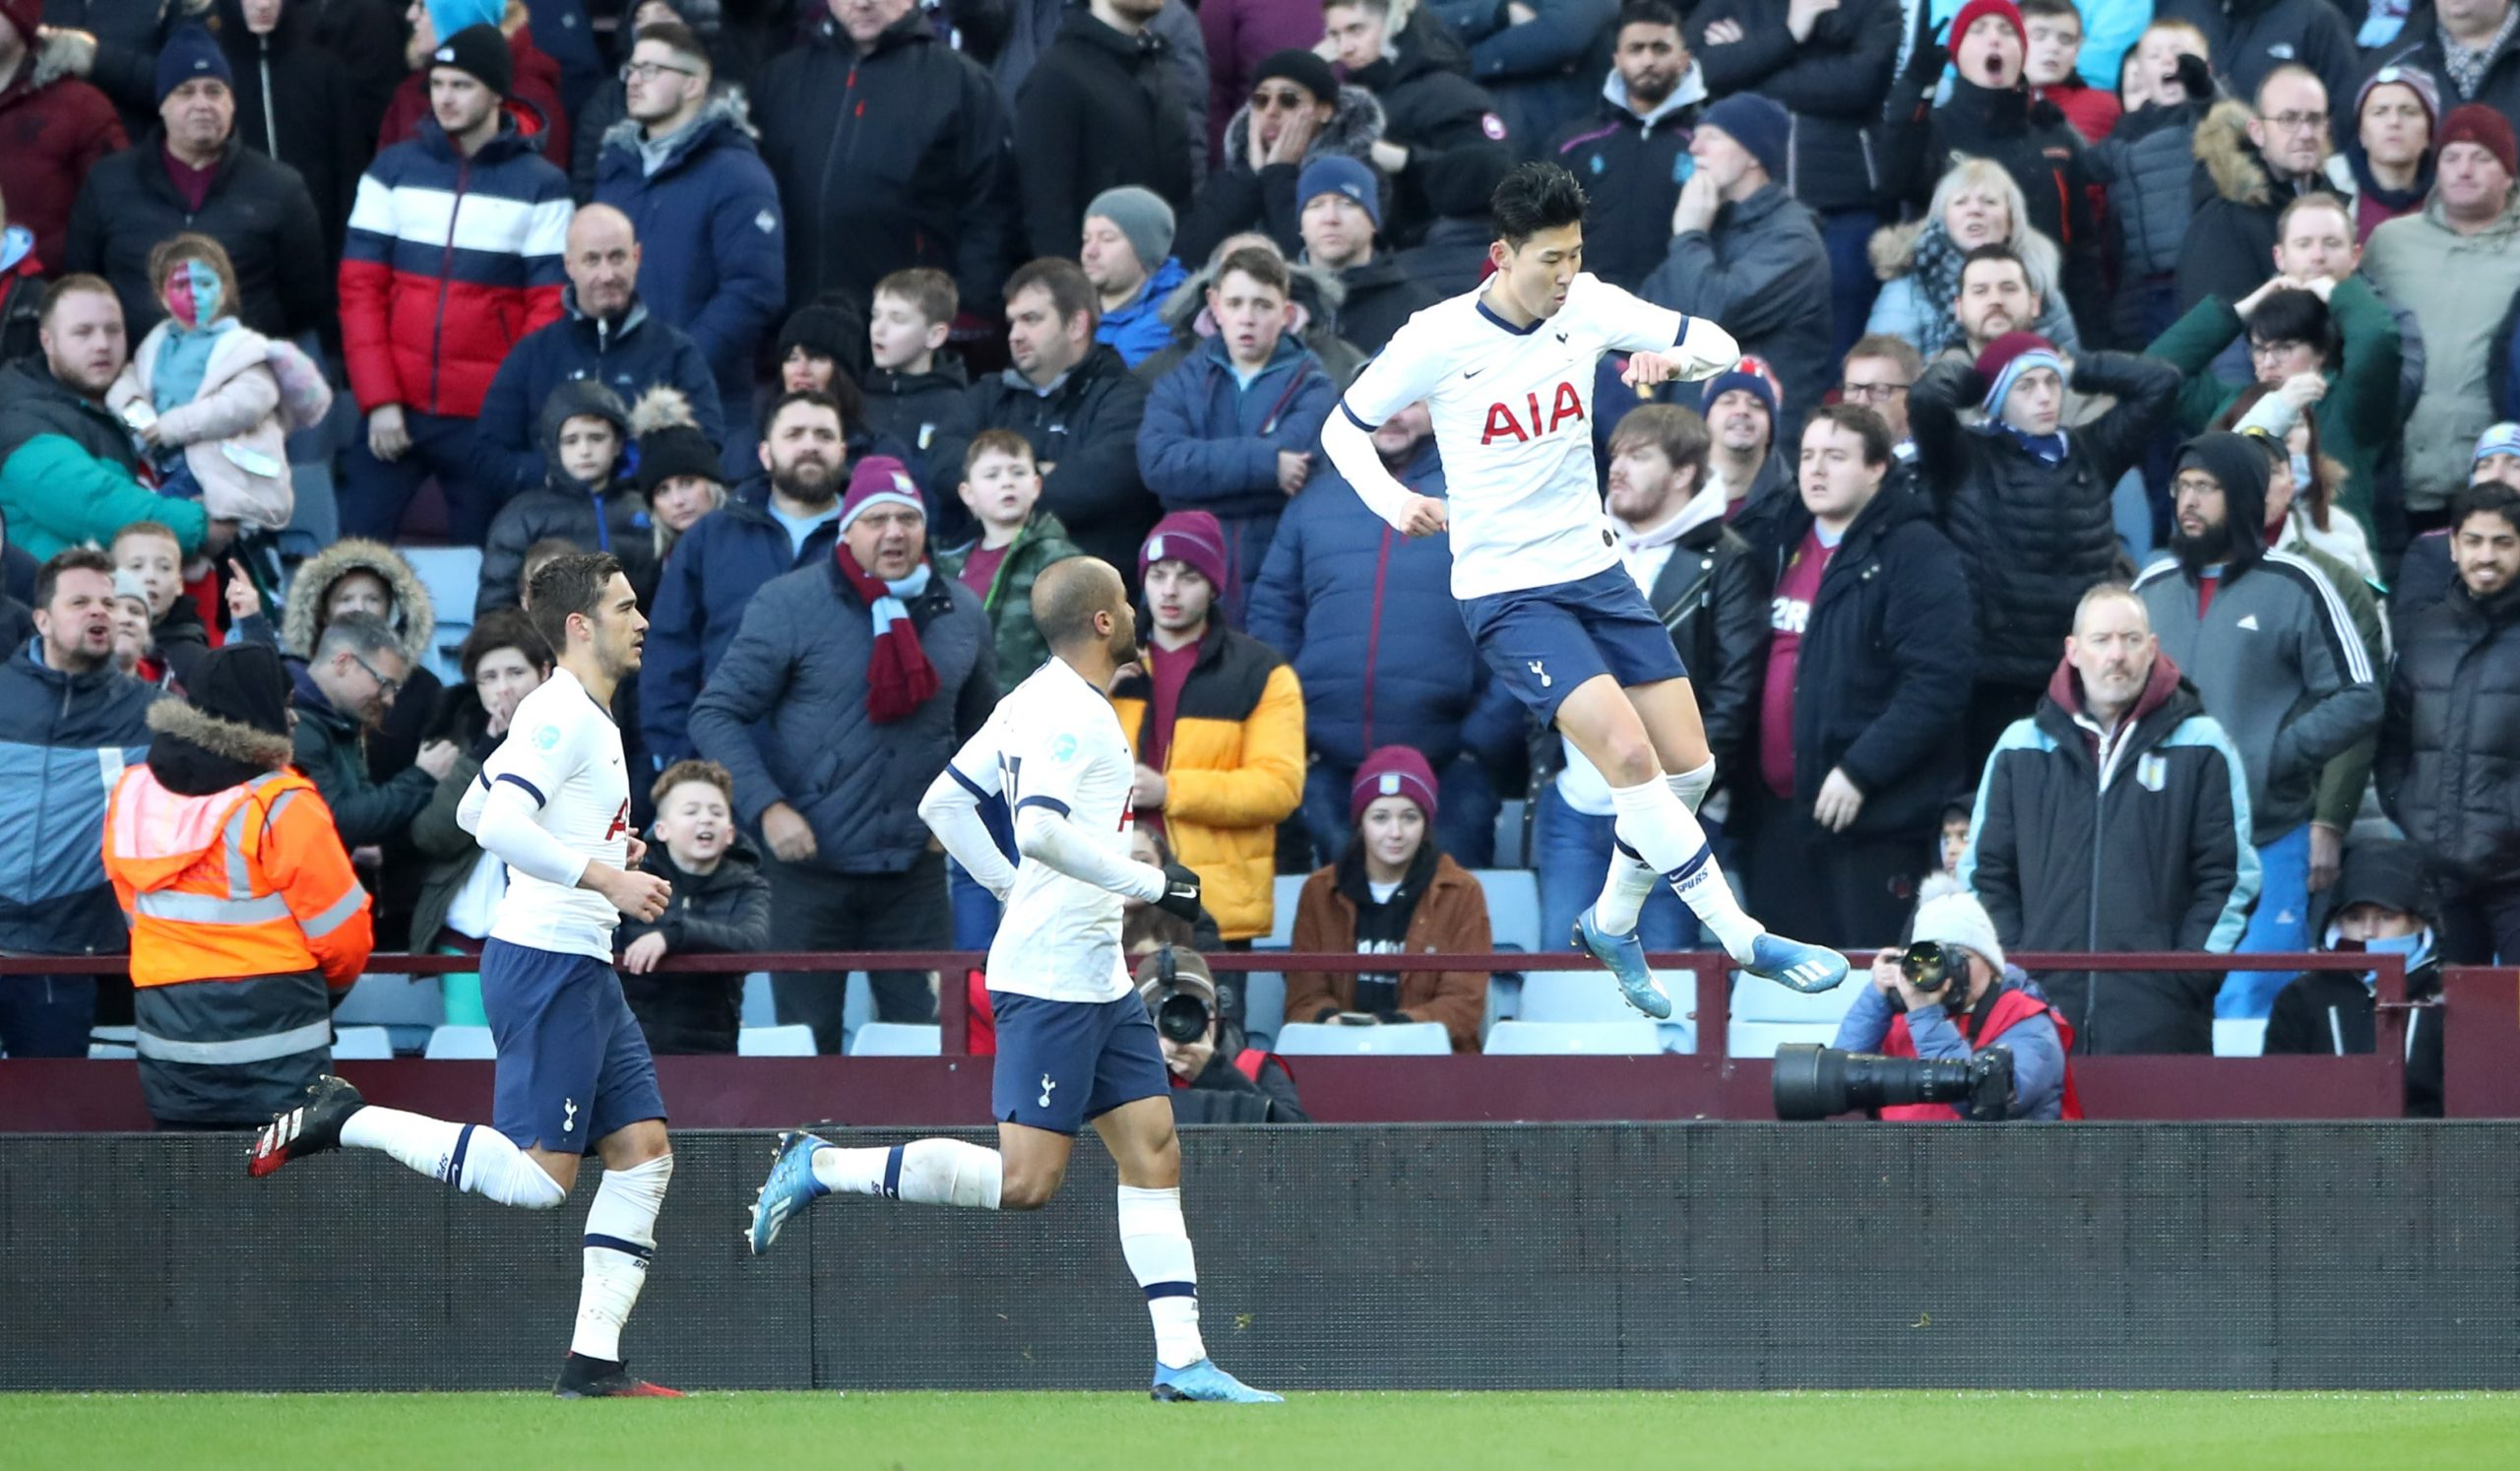 Son's Late Goal Secure Win For Spurs vs Villa; Boost Champions League Push